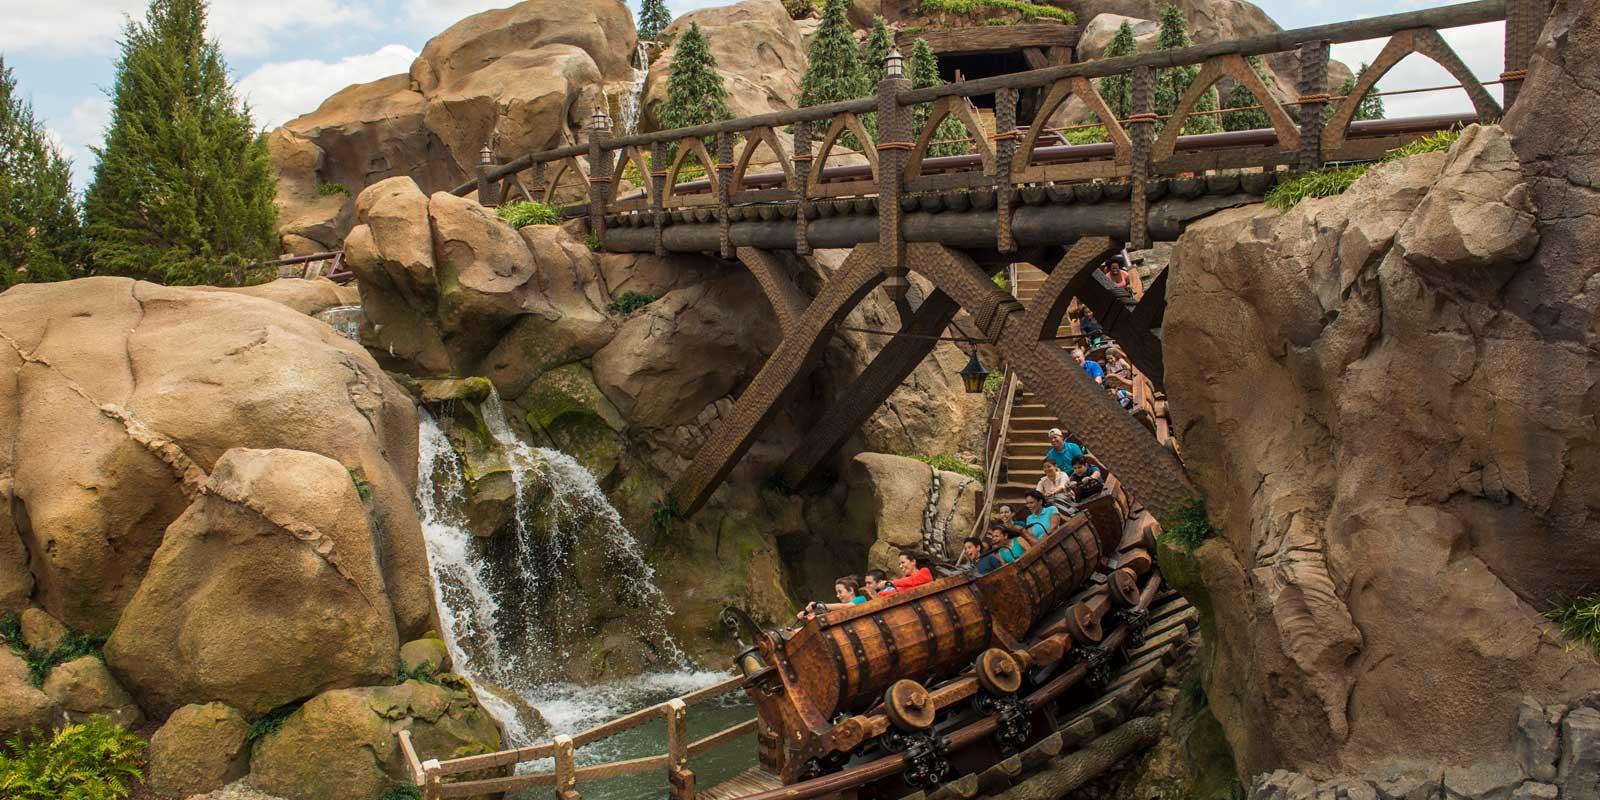 Photo of people enjoying the Seven Dwarves Mine Train at Magic Kingdom.